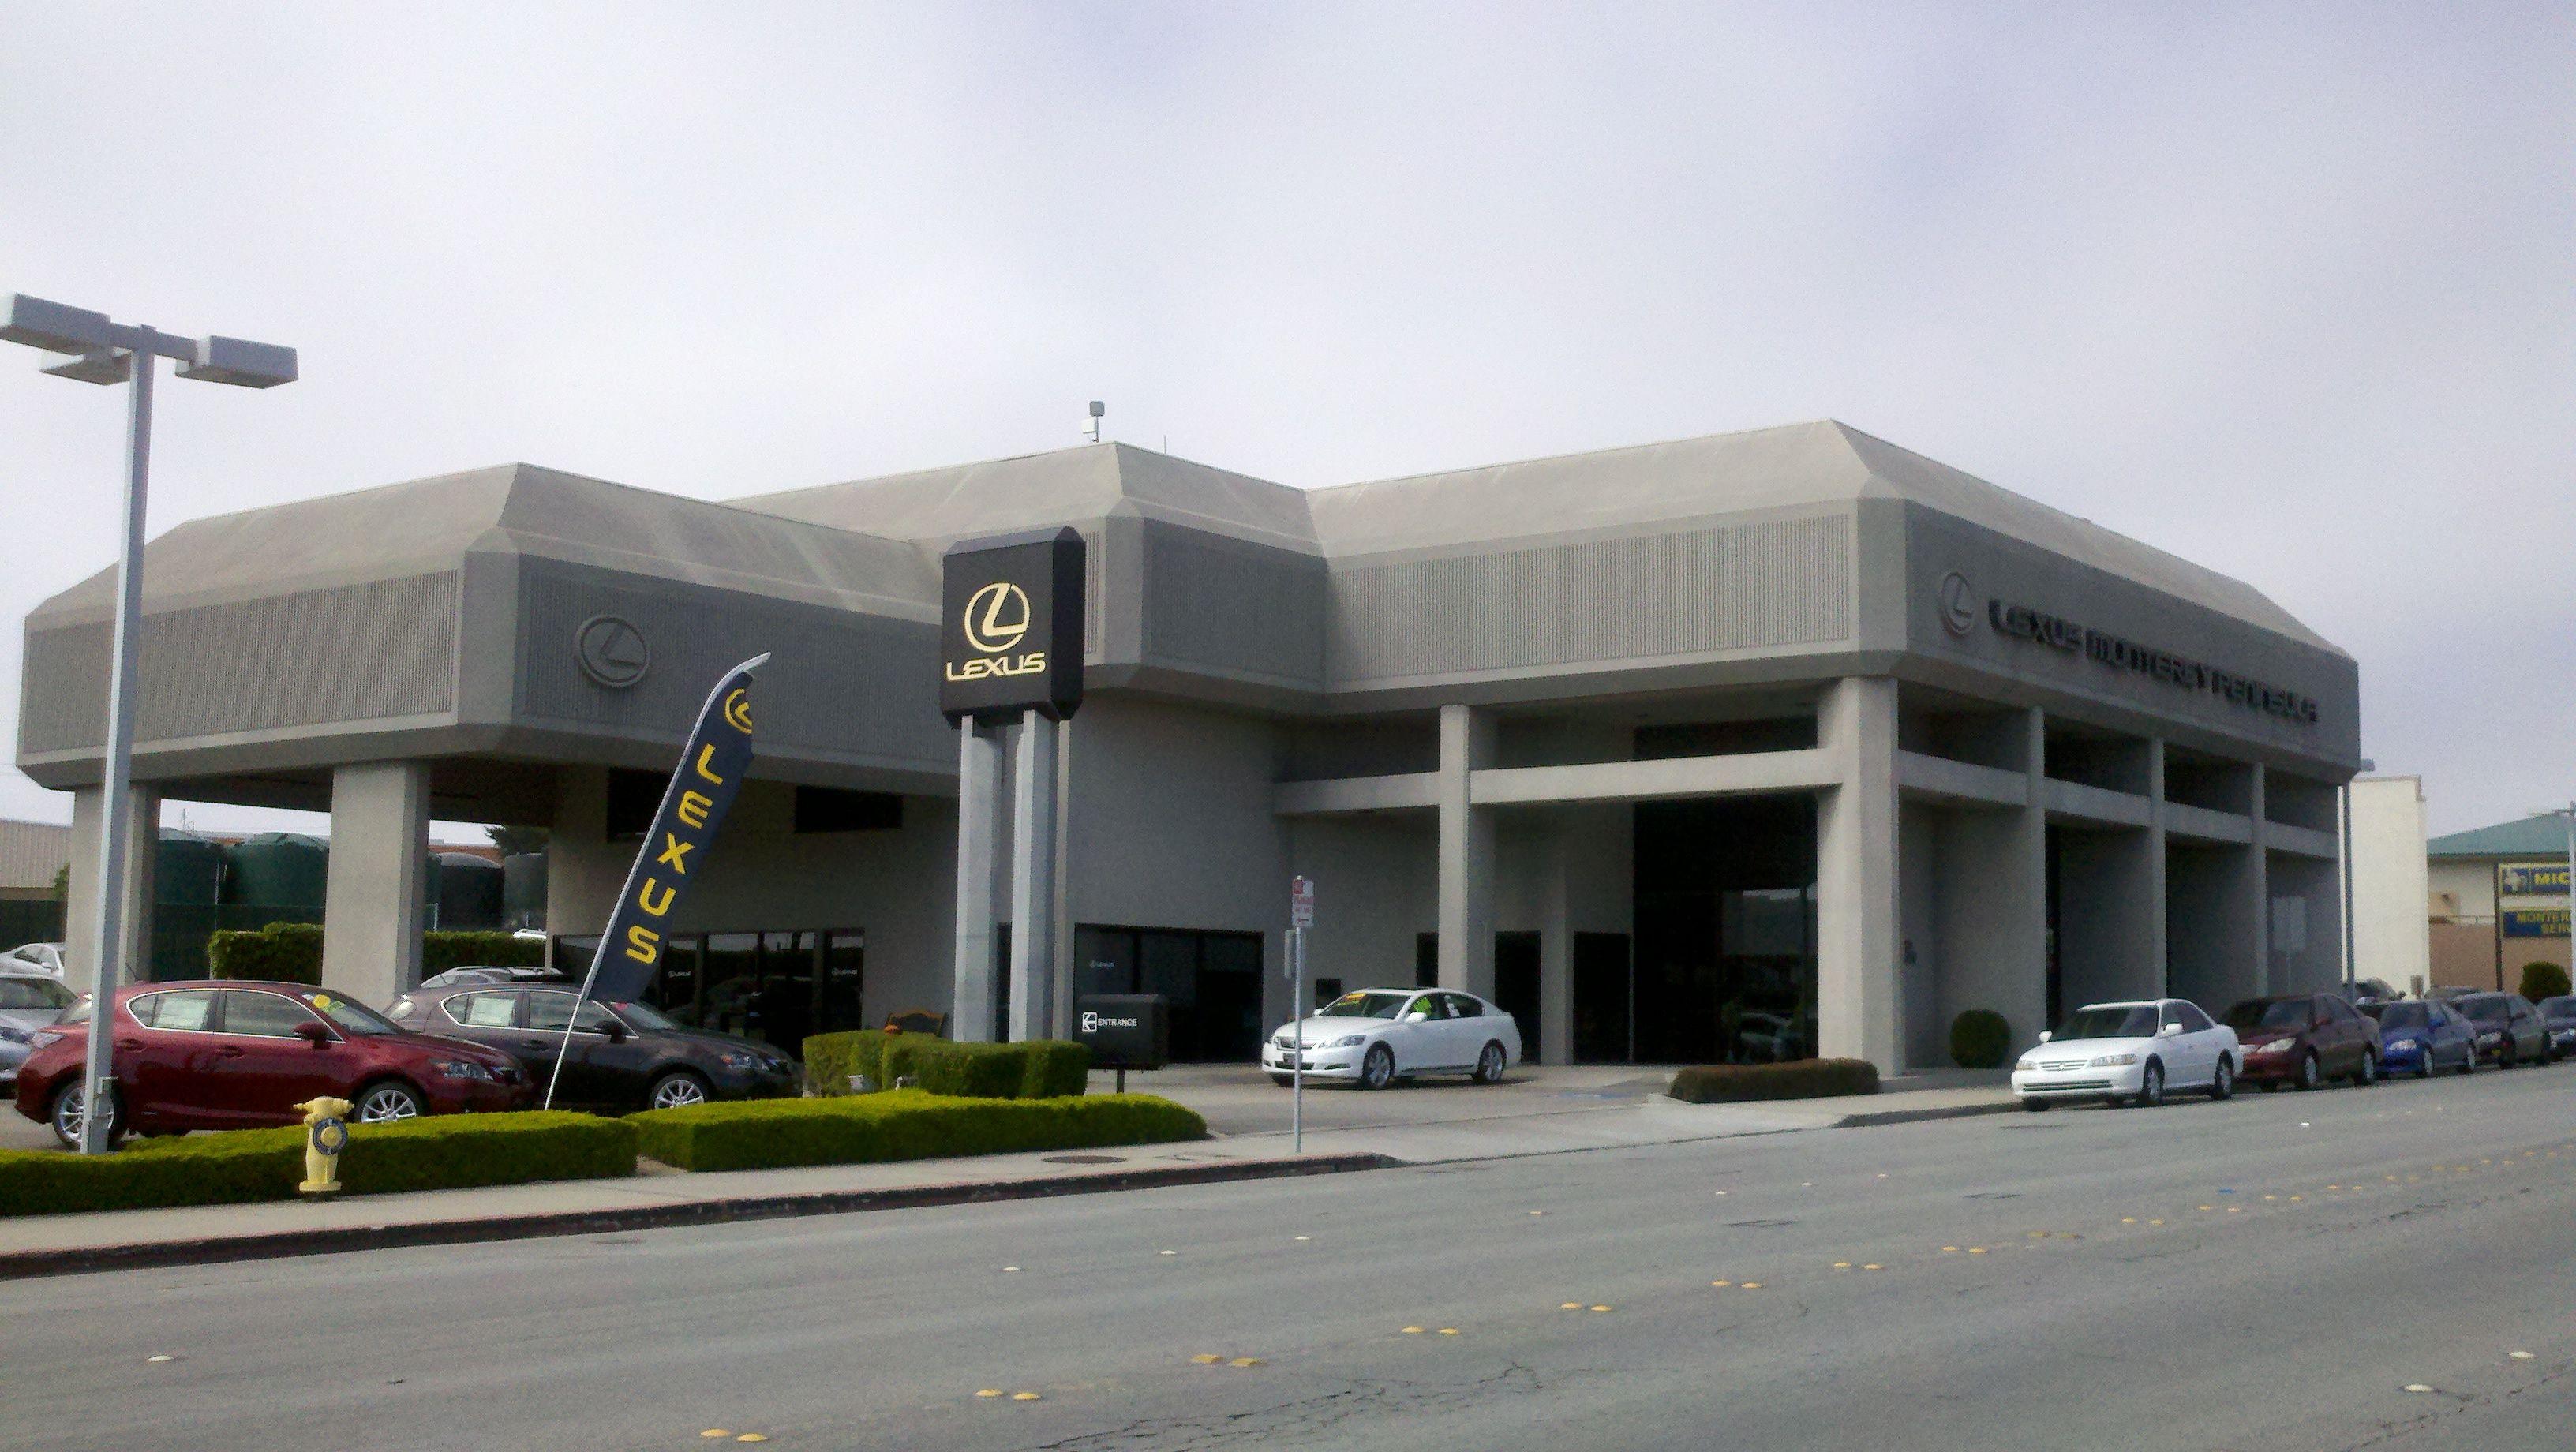 Lexus Monterey Peninsula House Styles Monterey Peninsula Mansions